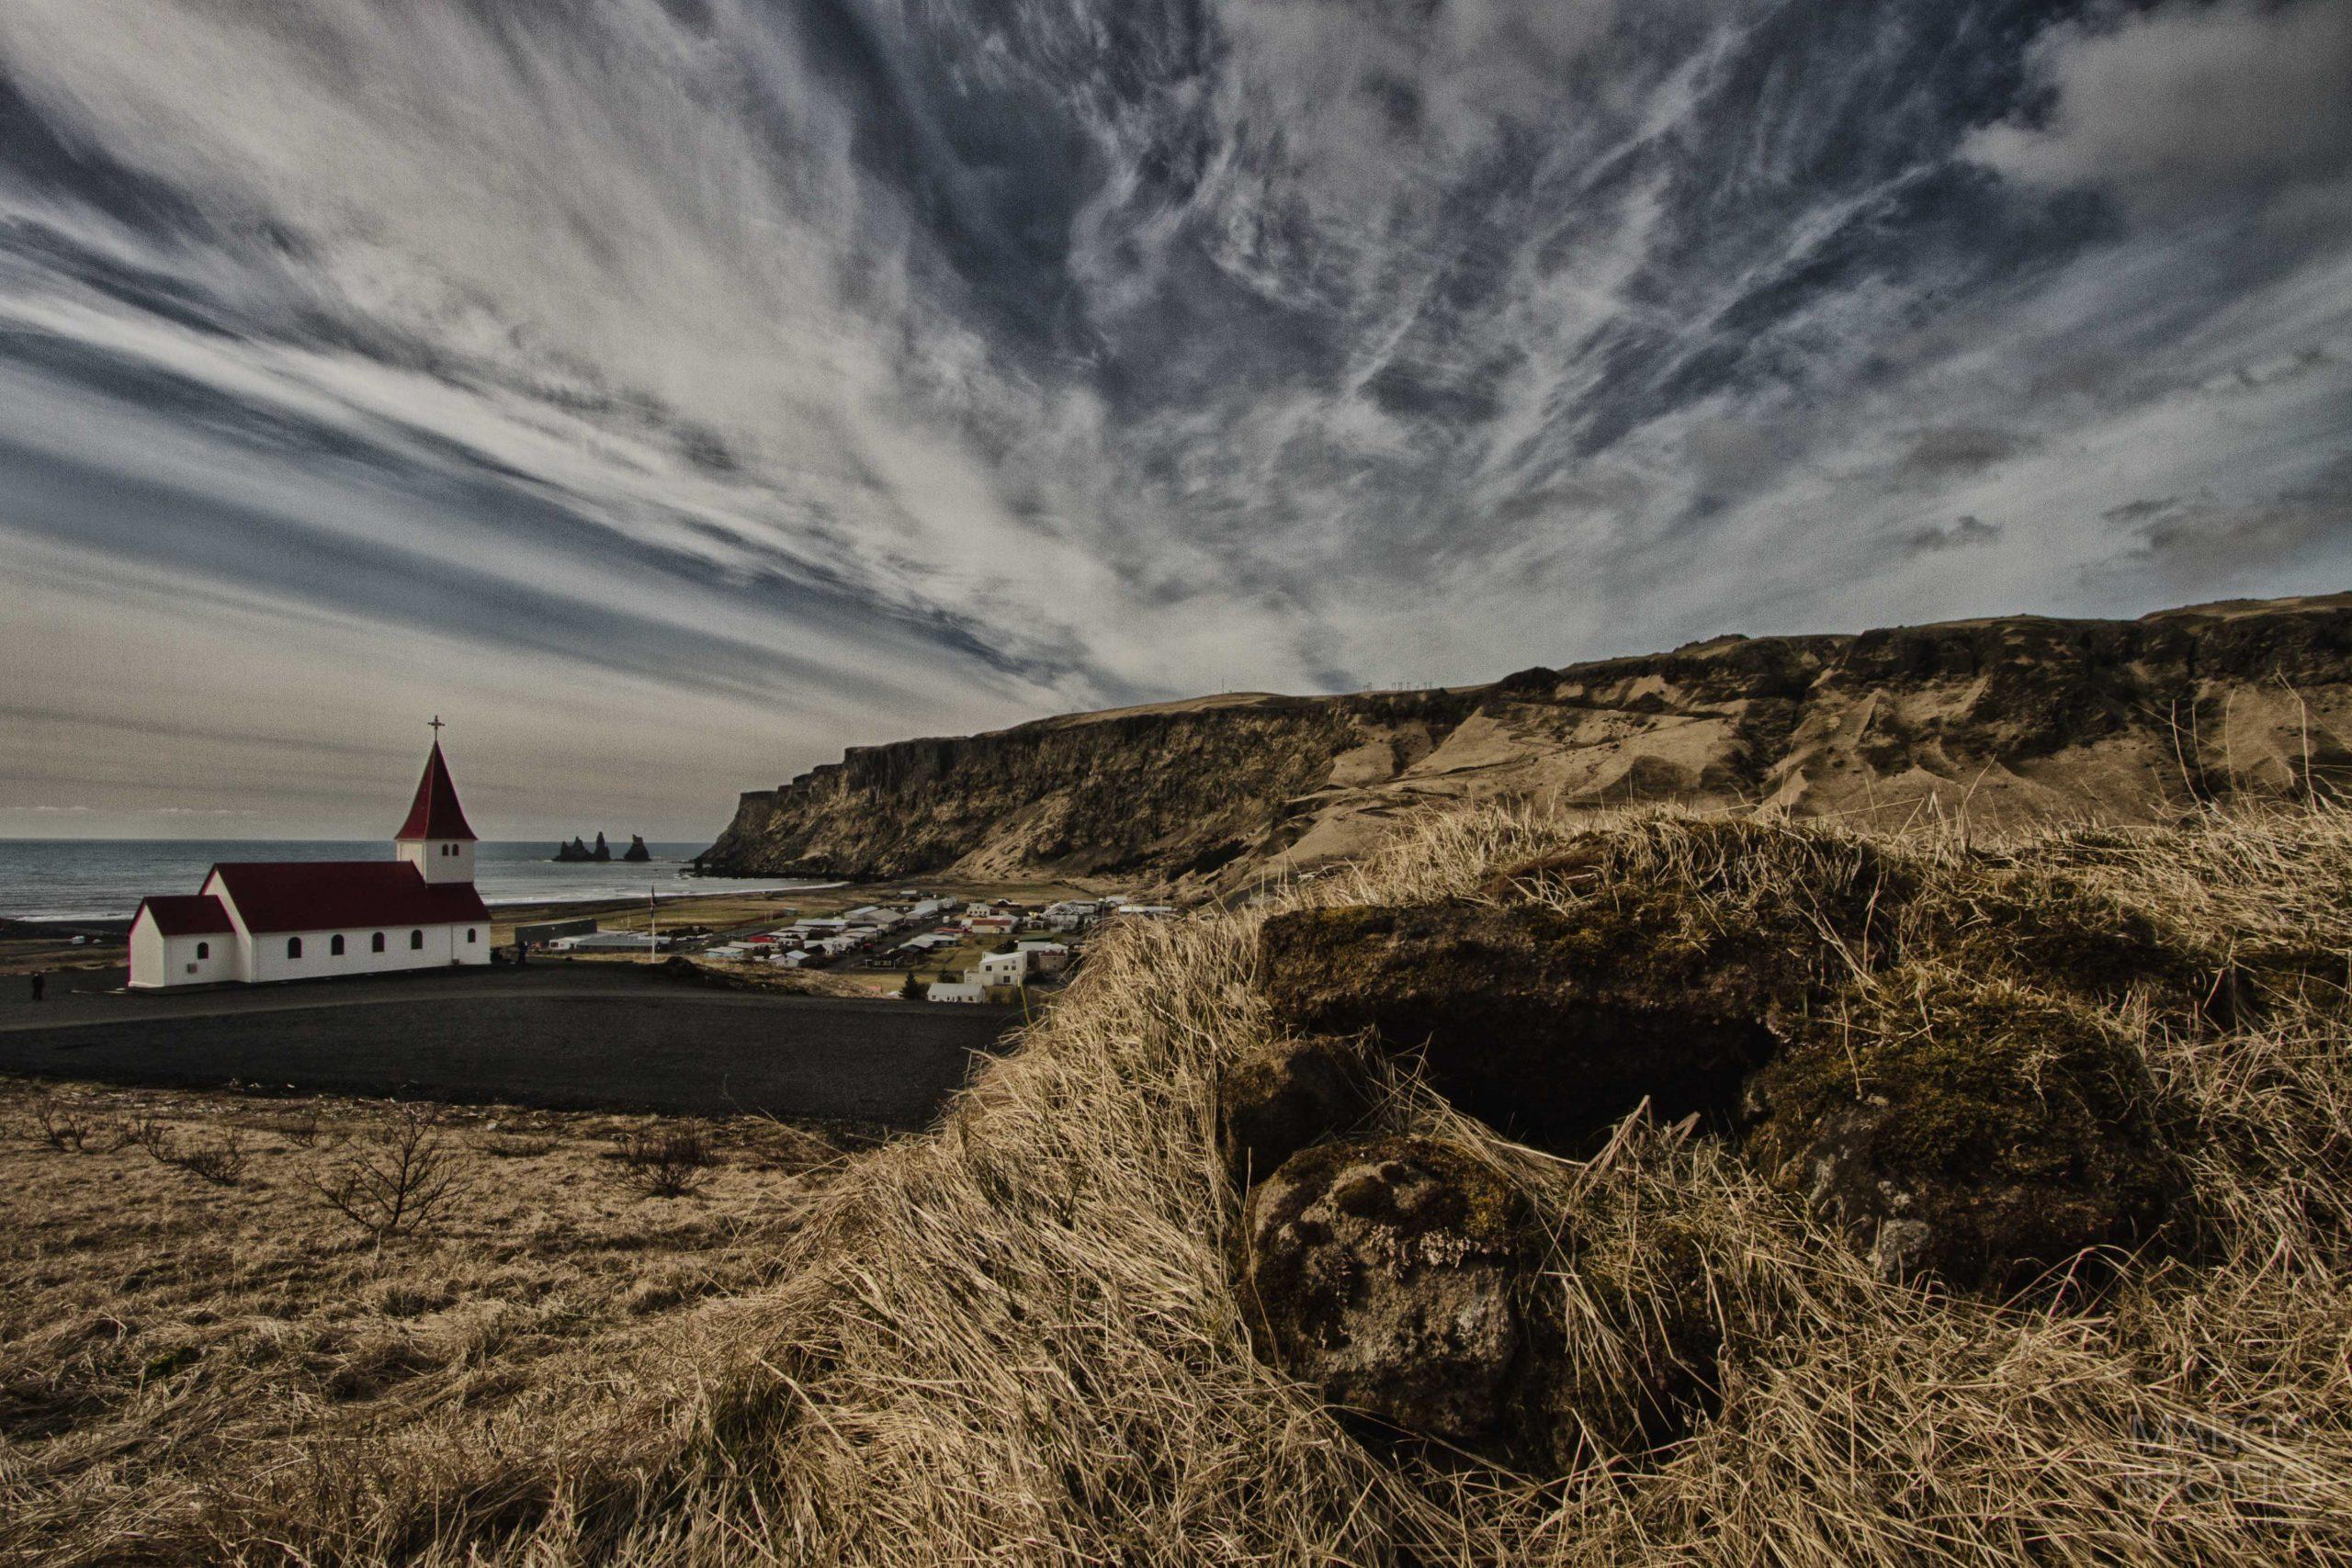 ISLANDIA-Abril-Carlos-Canon-EOS-7D2016-21010716-16538